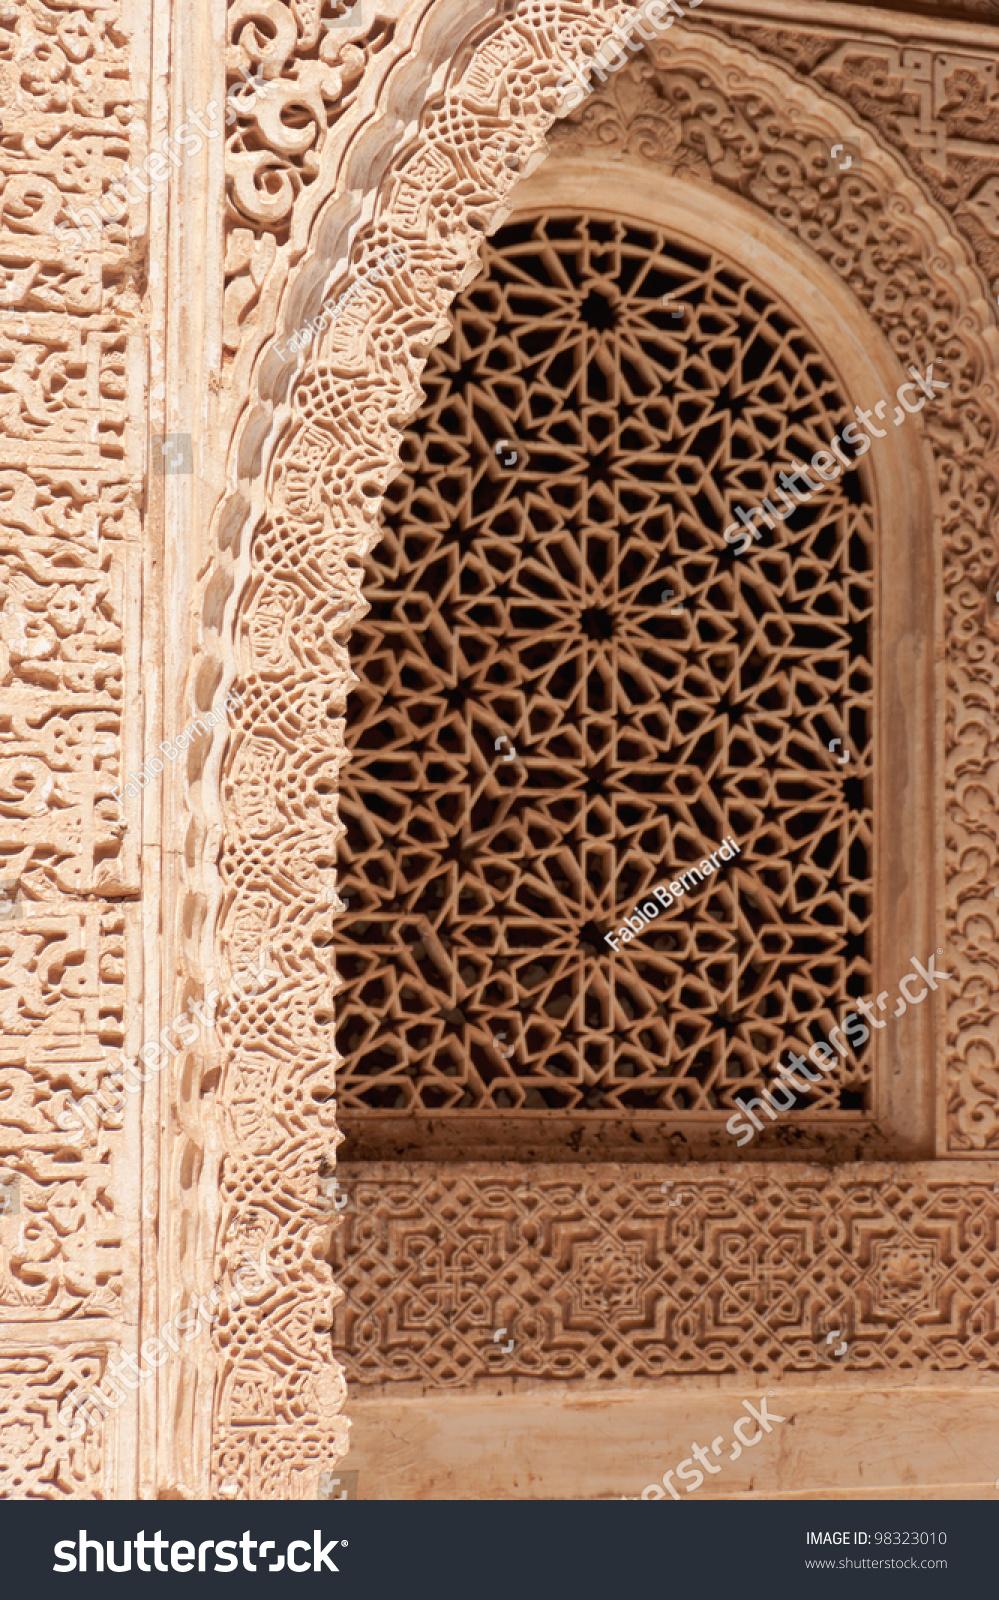 Decorations In Spain Detail Of Mudejar Decorations In Seville Mudejar Style Spread In